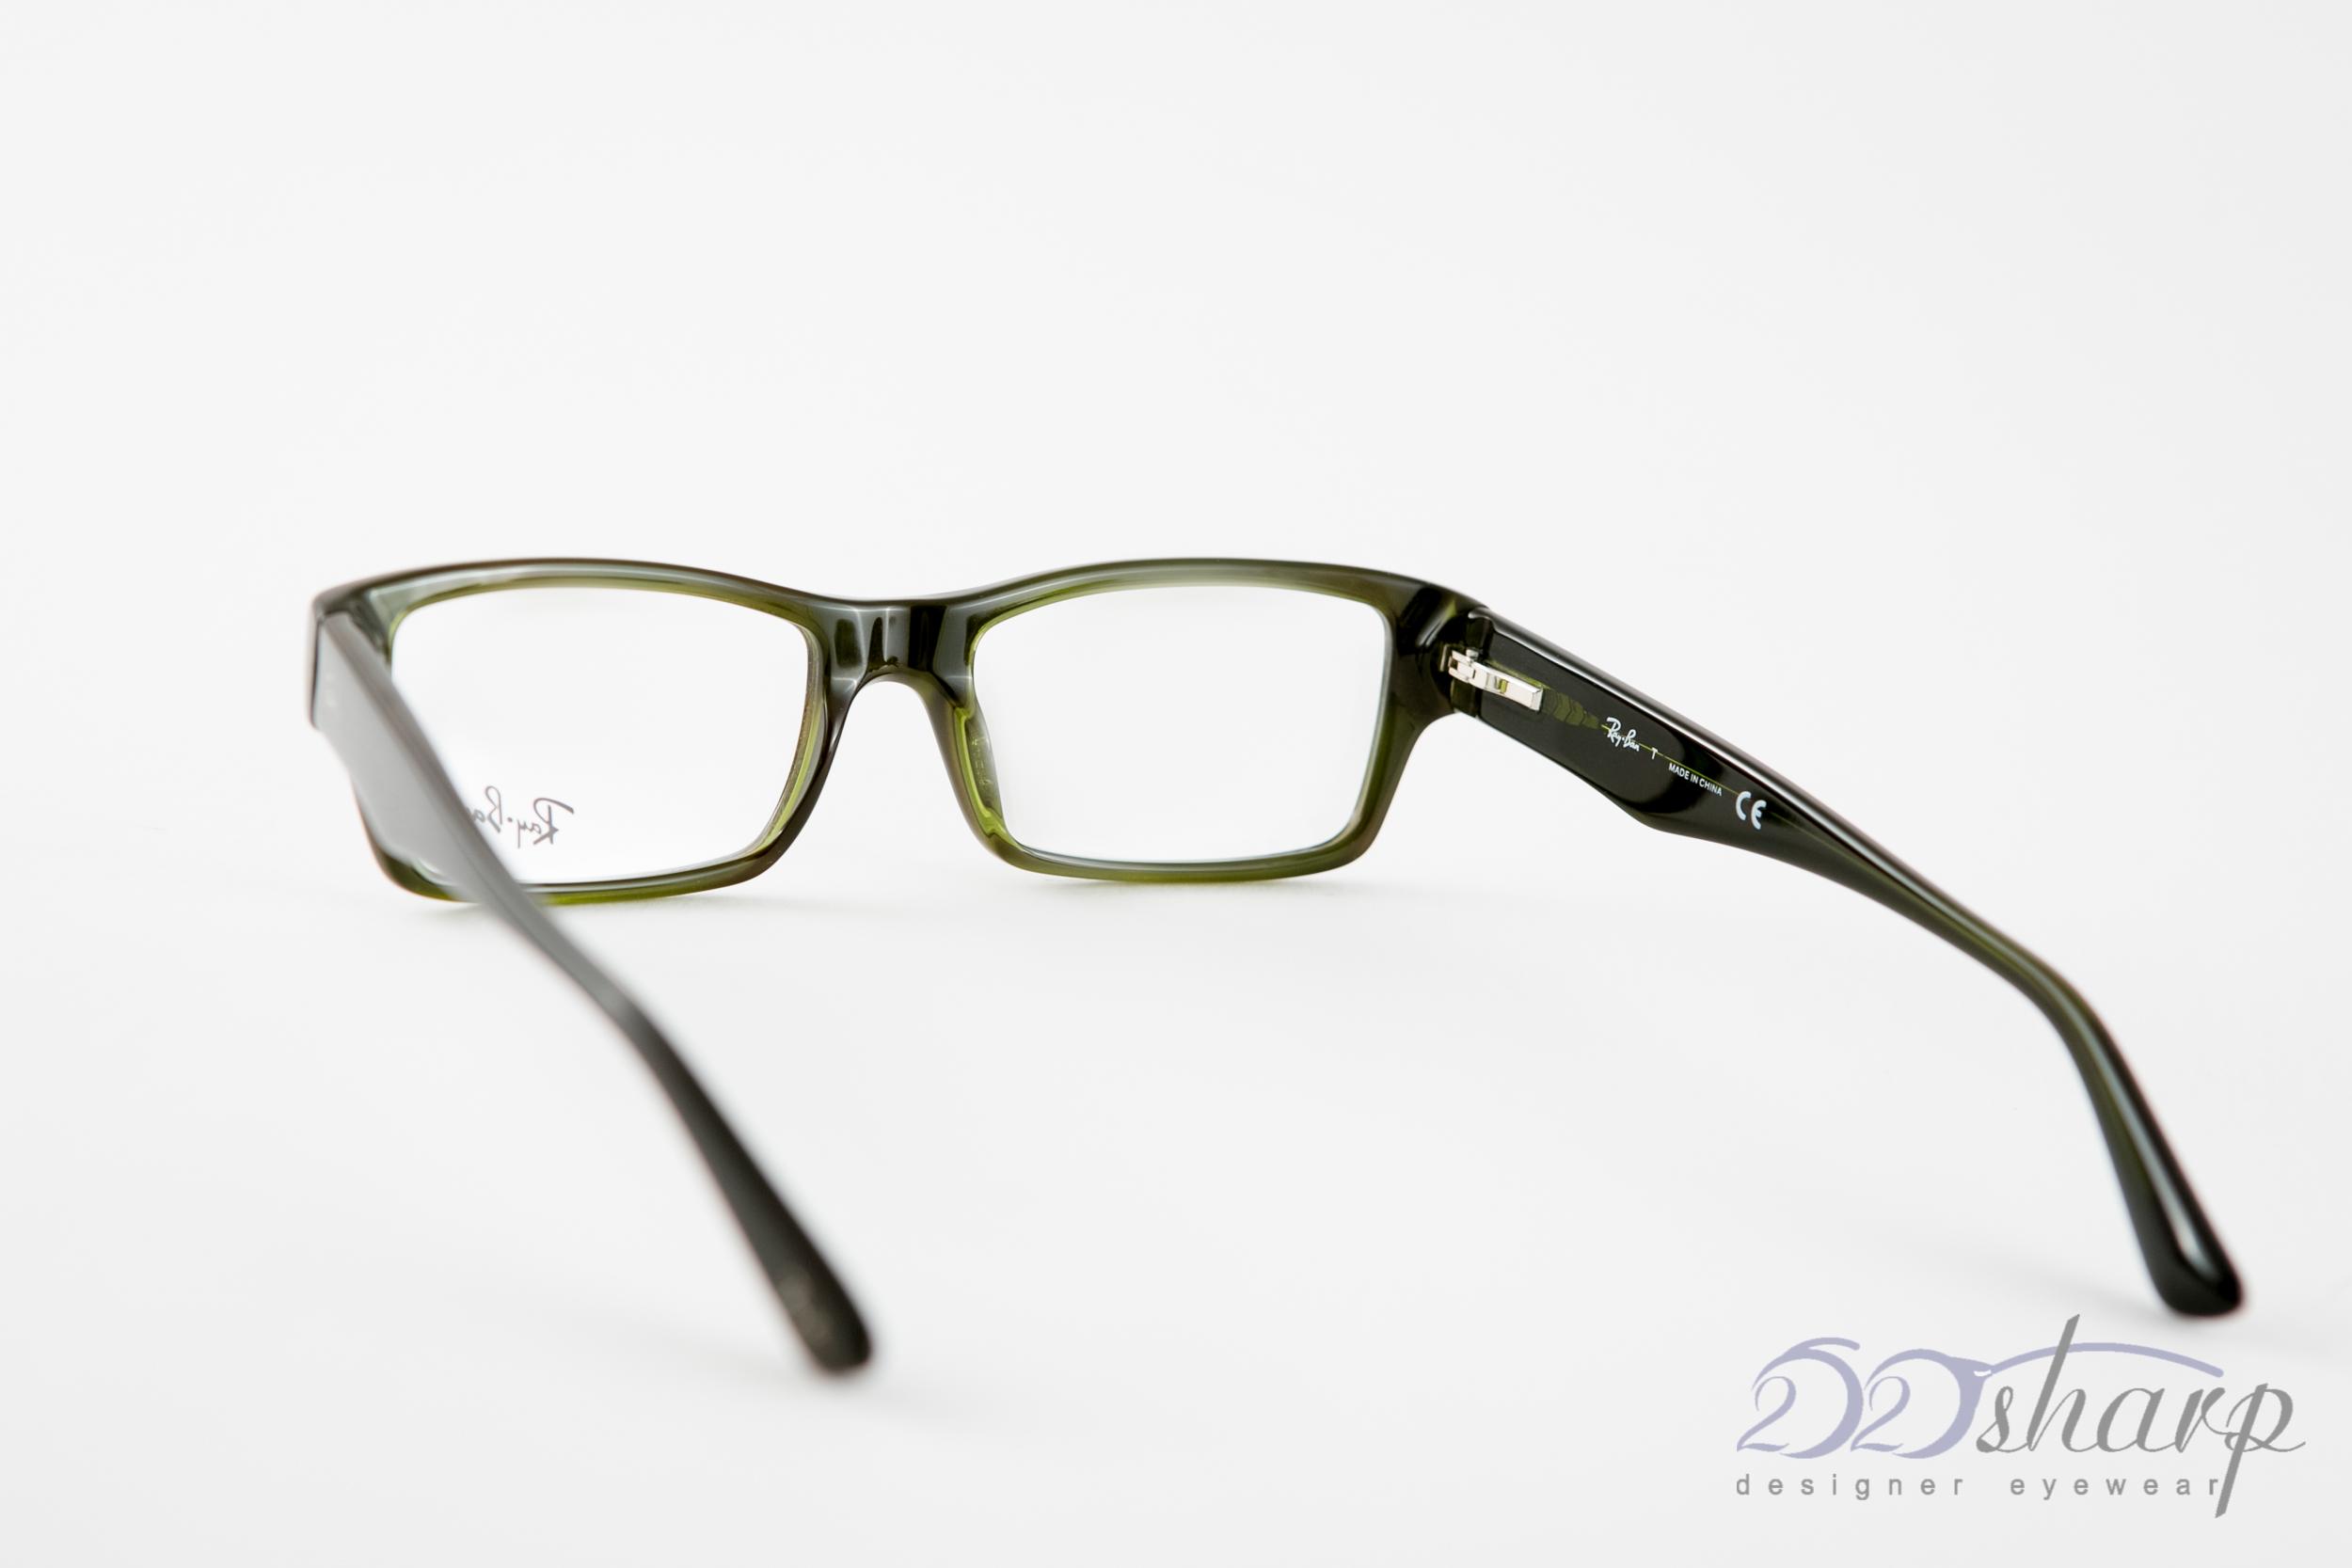 Ray Ban Eyeglasses Ray Ban Black 54 18 145